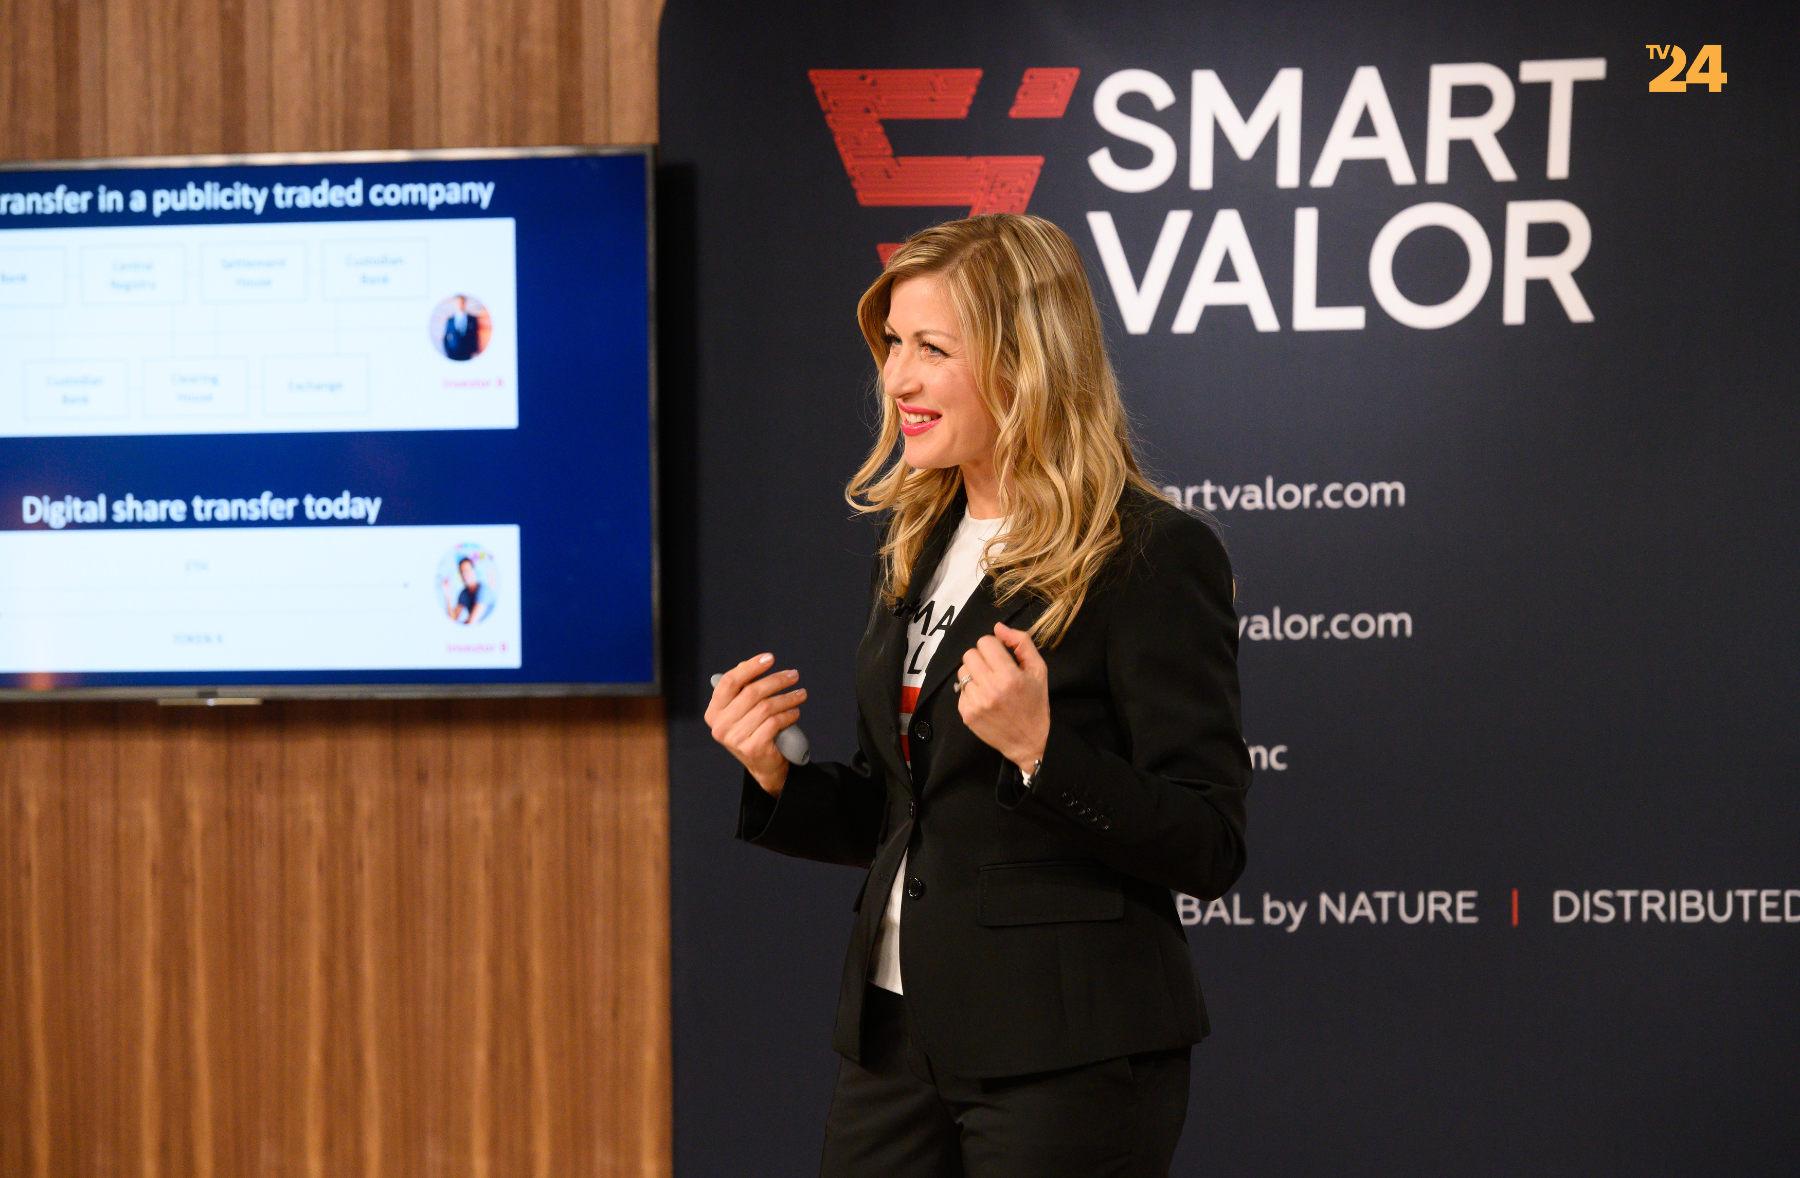 SMART VALOR CEO Olga Feldmeier